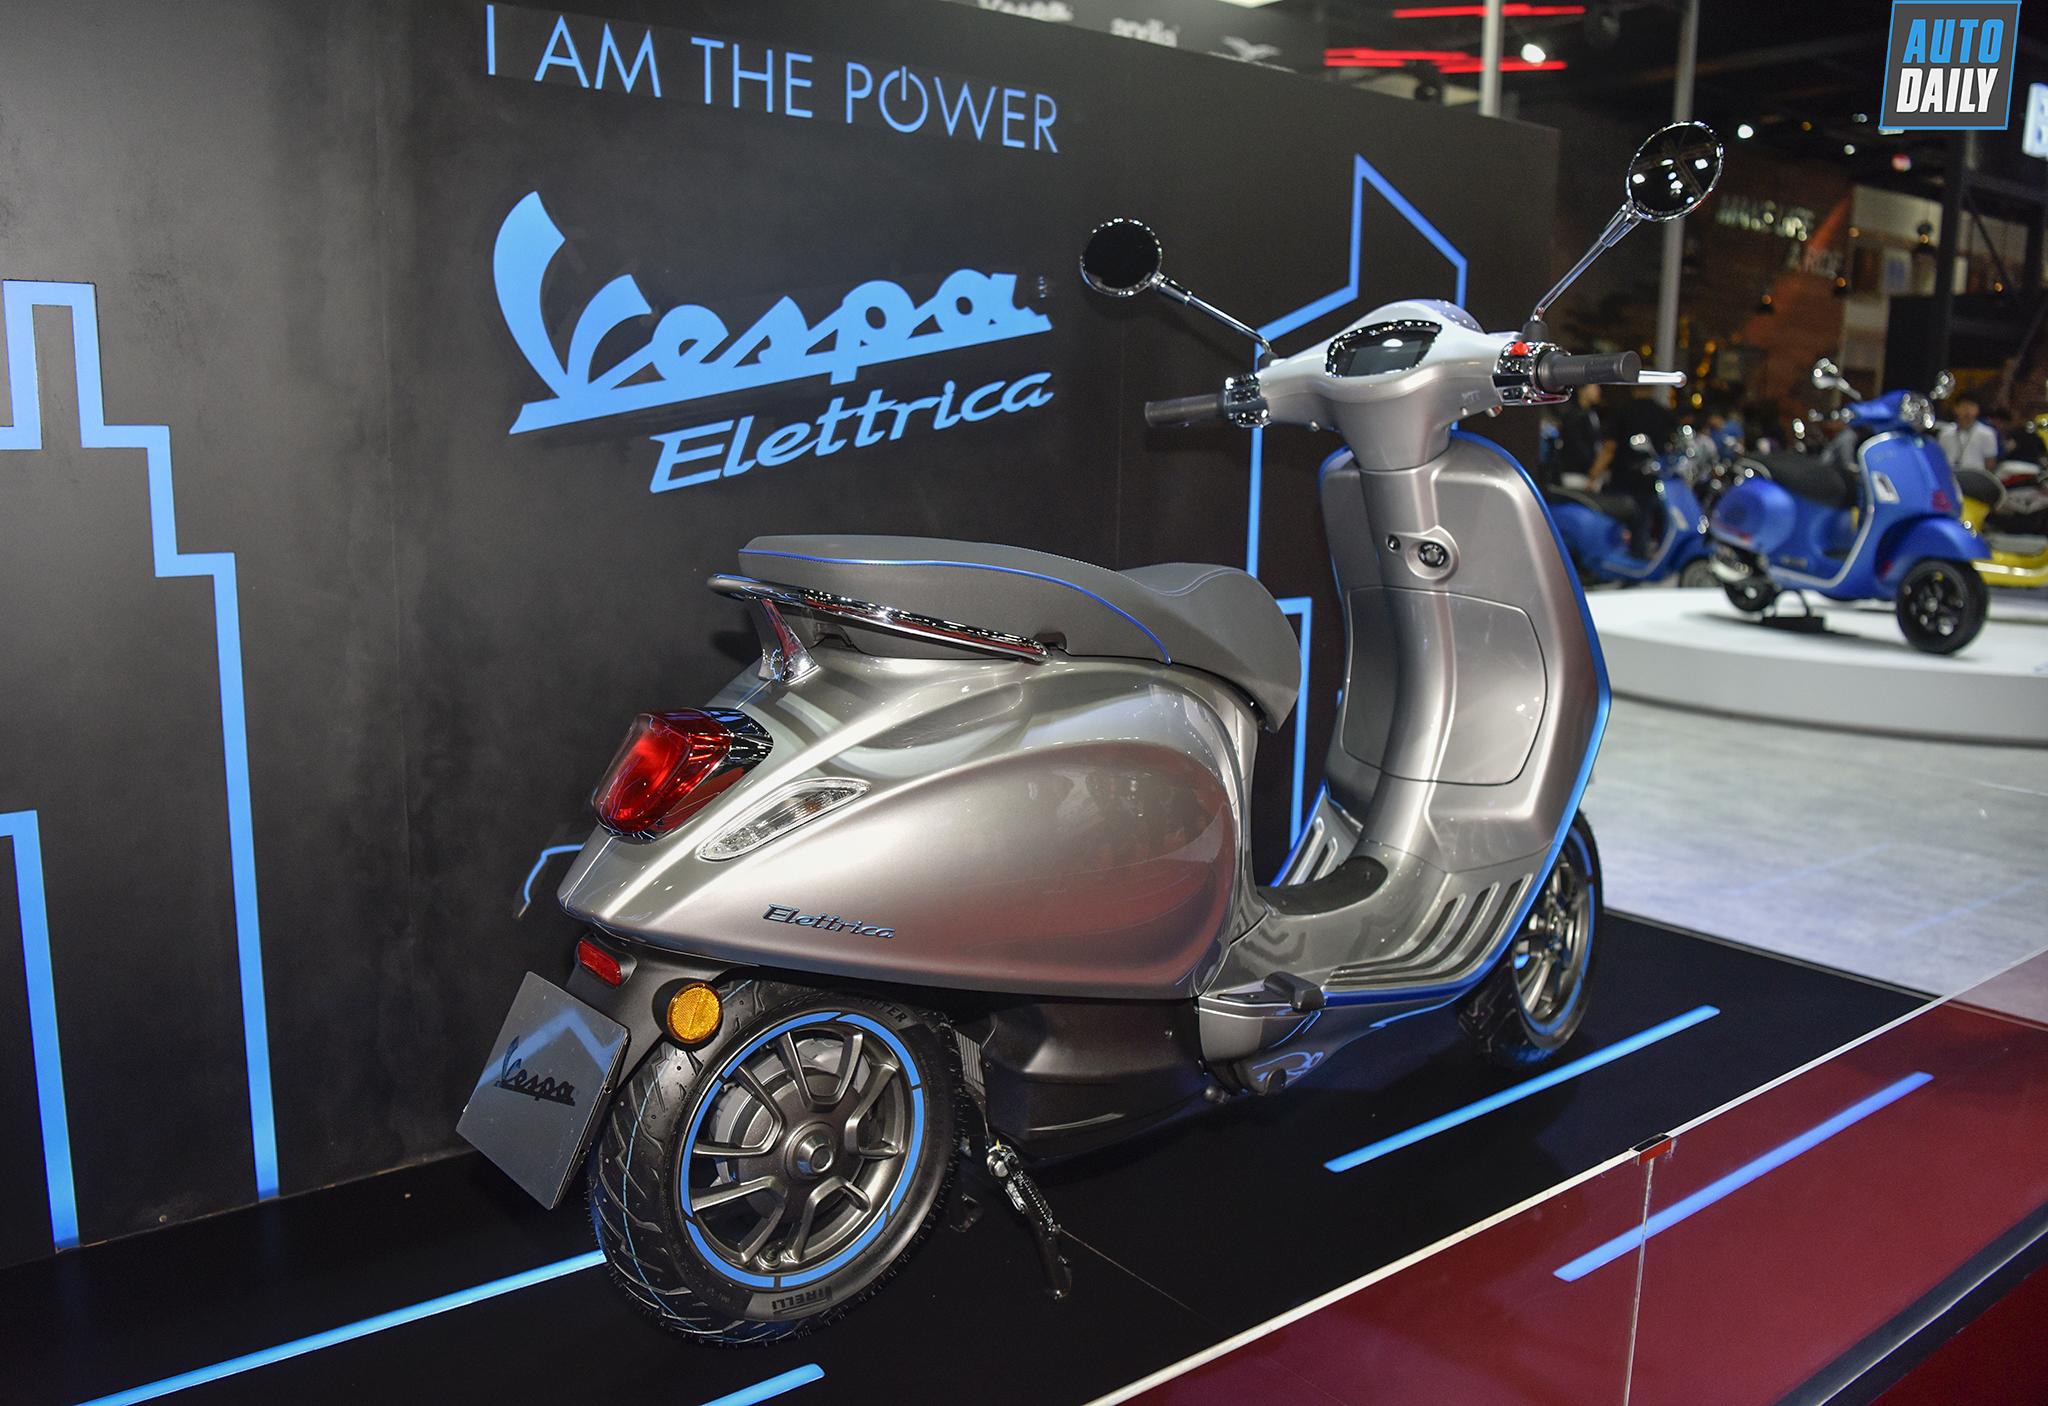 vespa-elettrica-bangkok-motor-show-autodaily-04.jpg